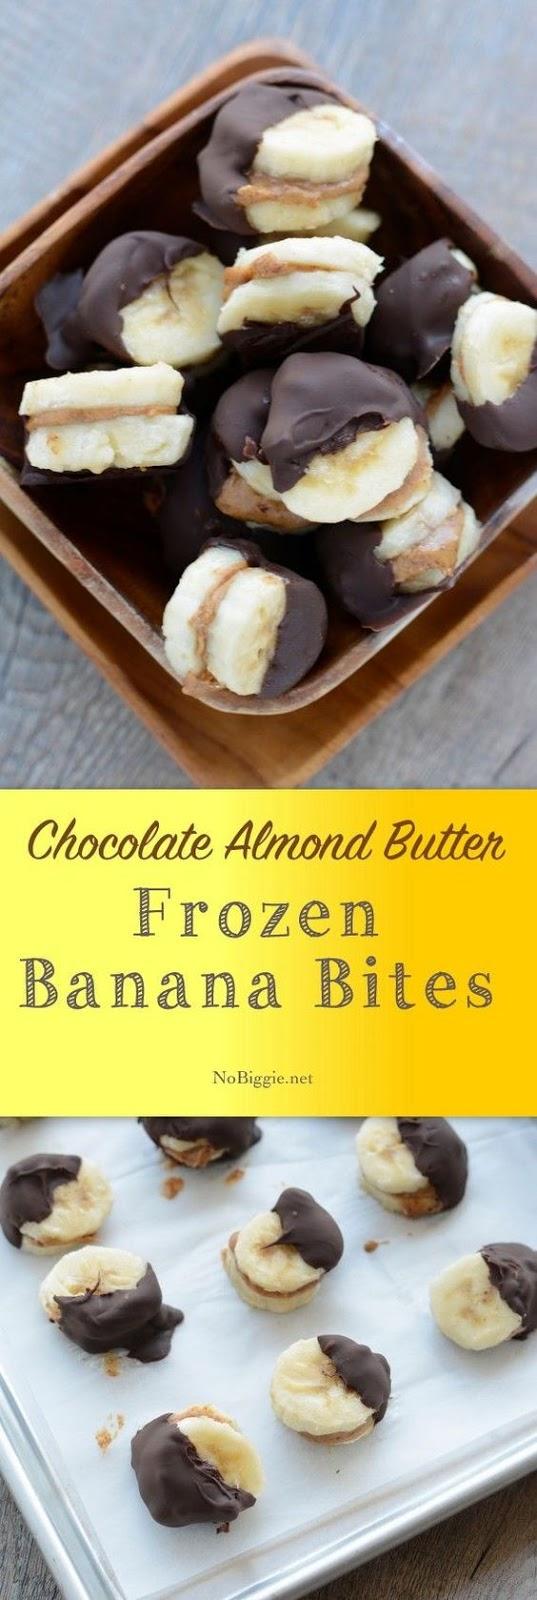 Frozen Banana Bites #frozen #banana #bites #healthyfood #healthysnack #healthysnackideas